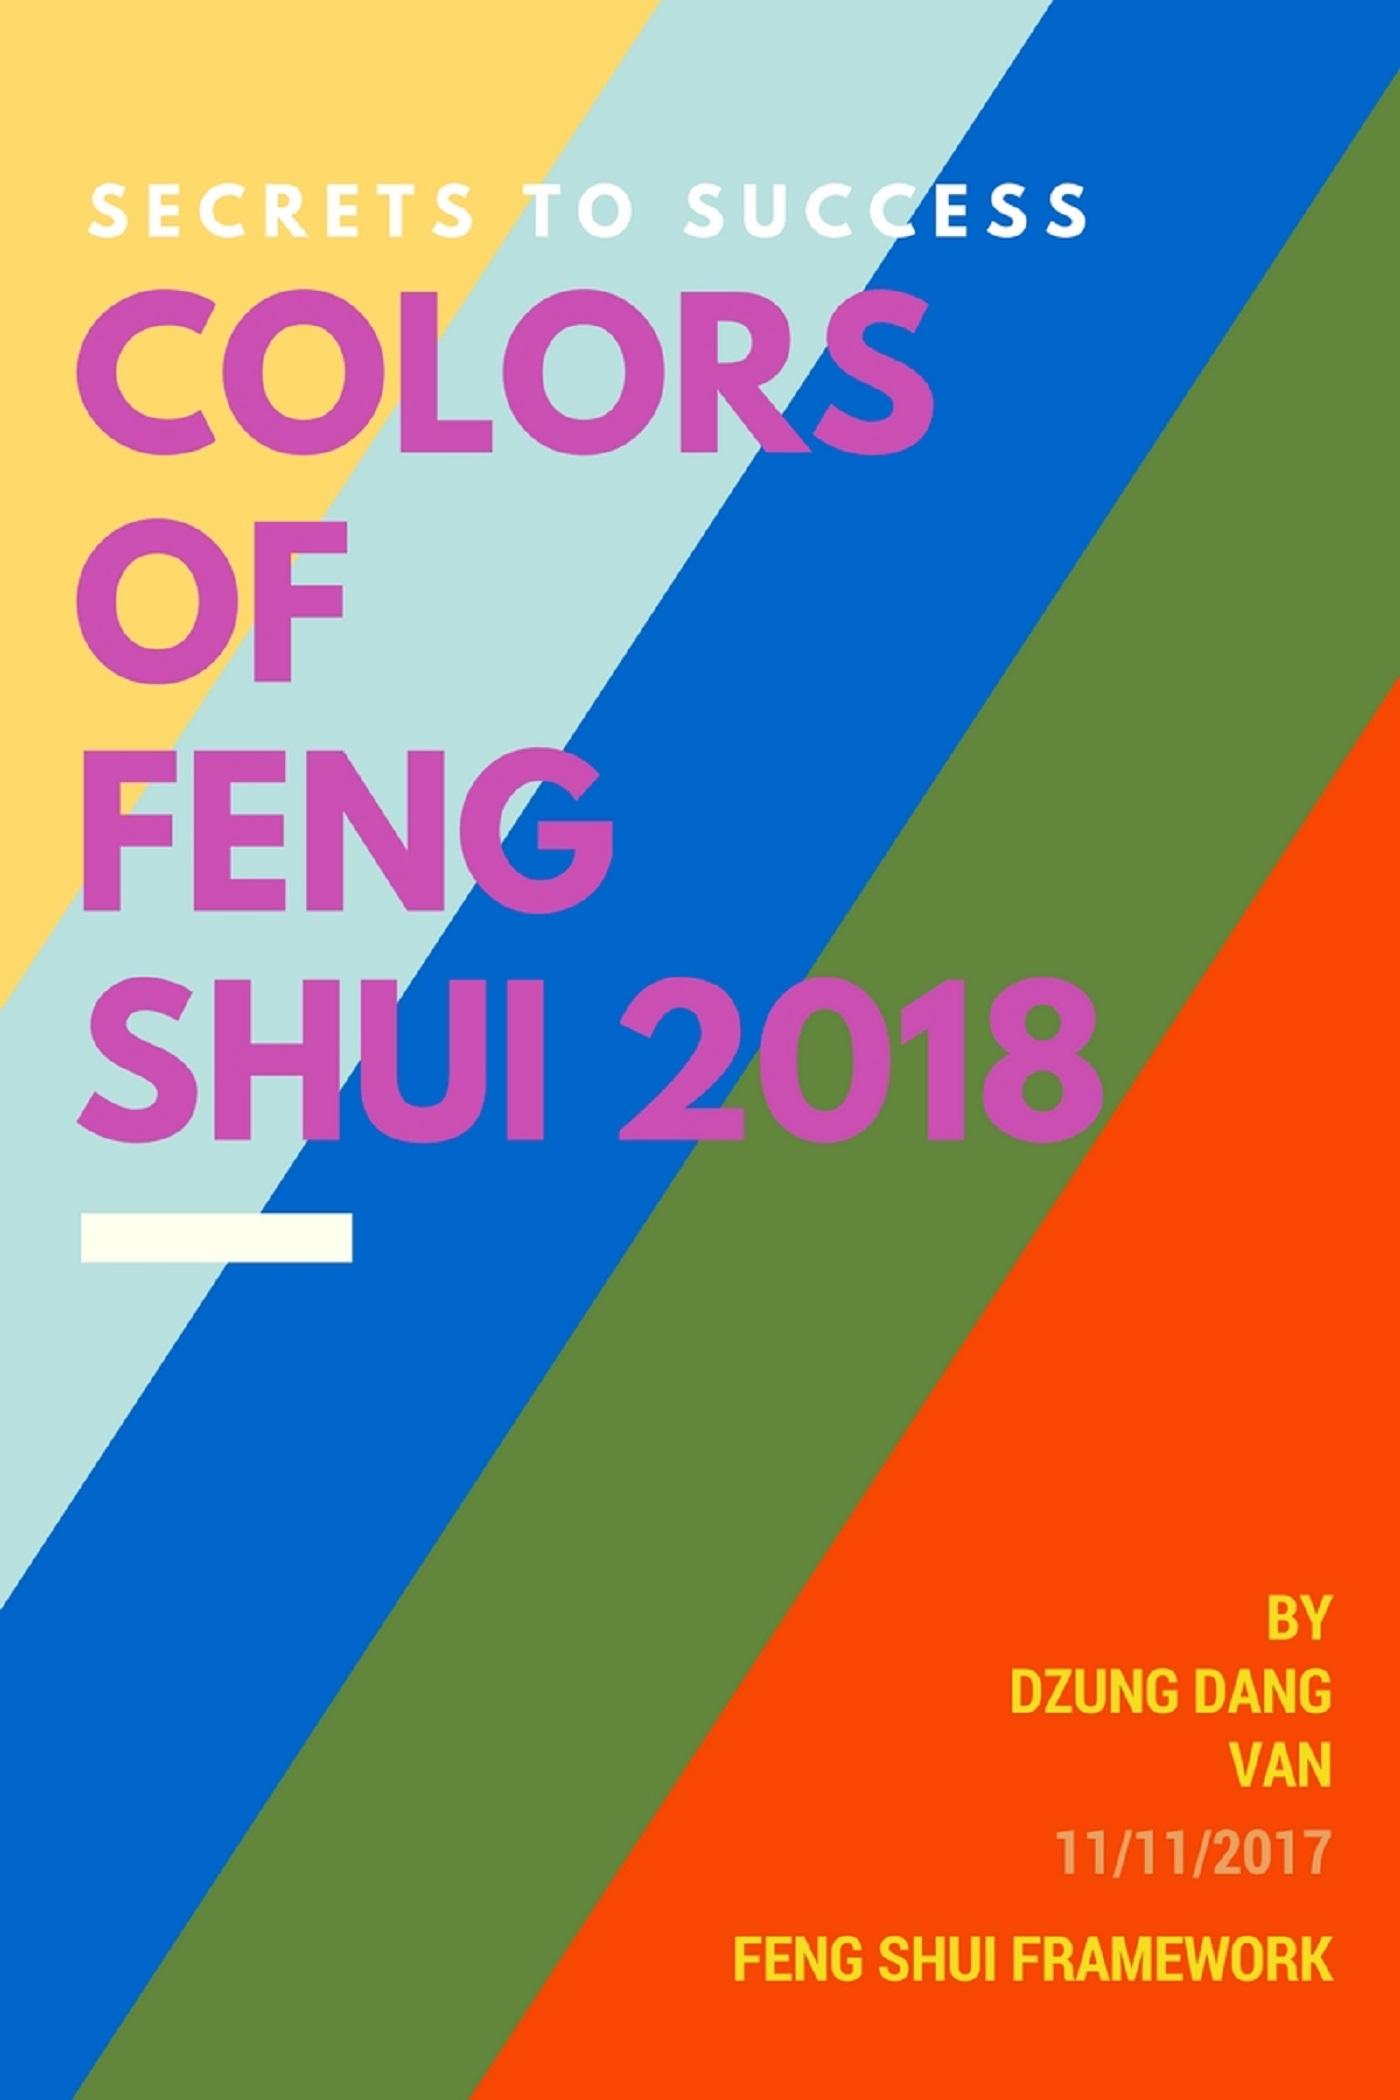 Smashwords secrets to success colors of feng shui 2018 Colores feng shui 2016